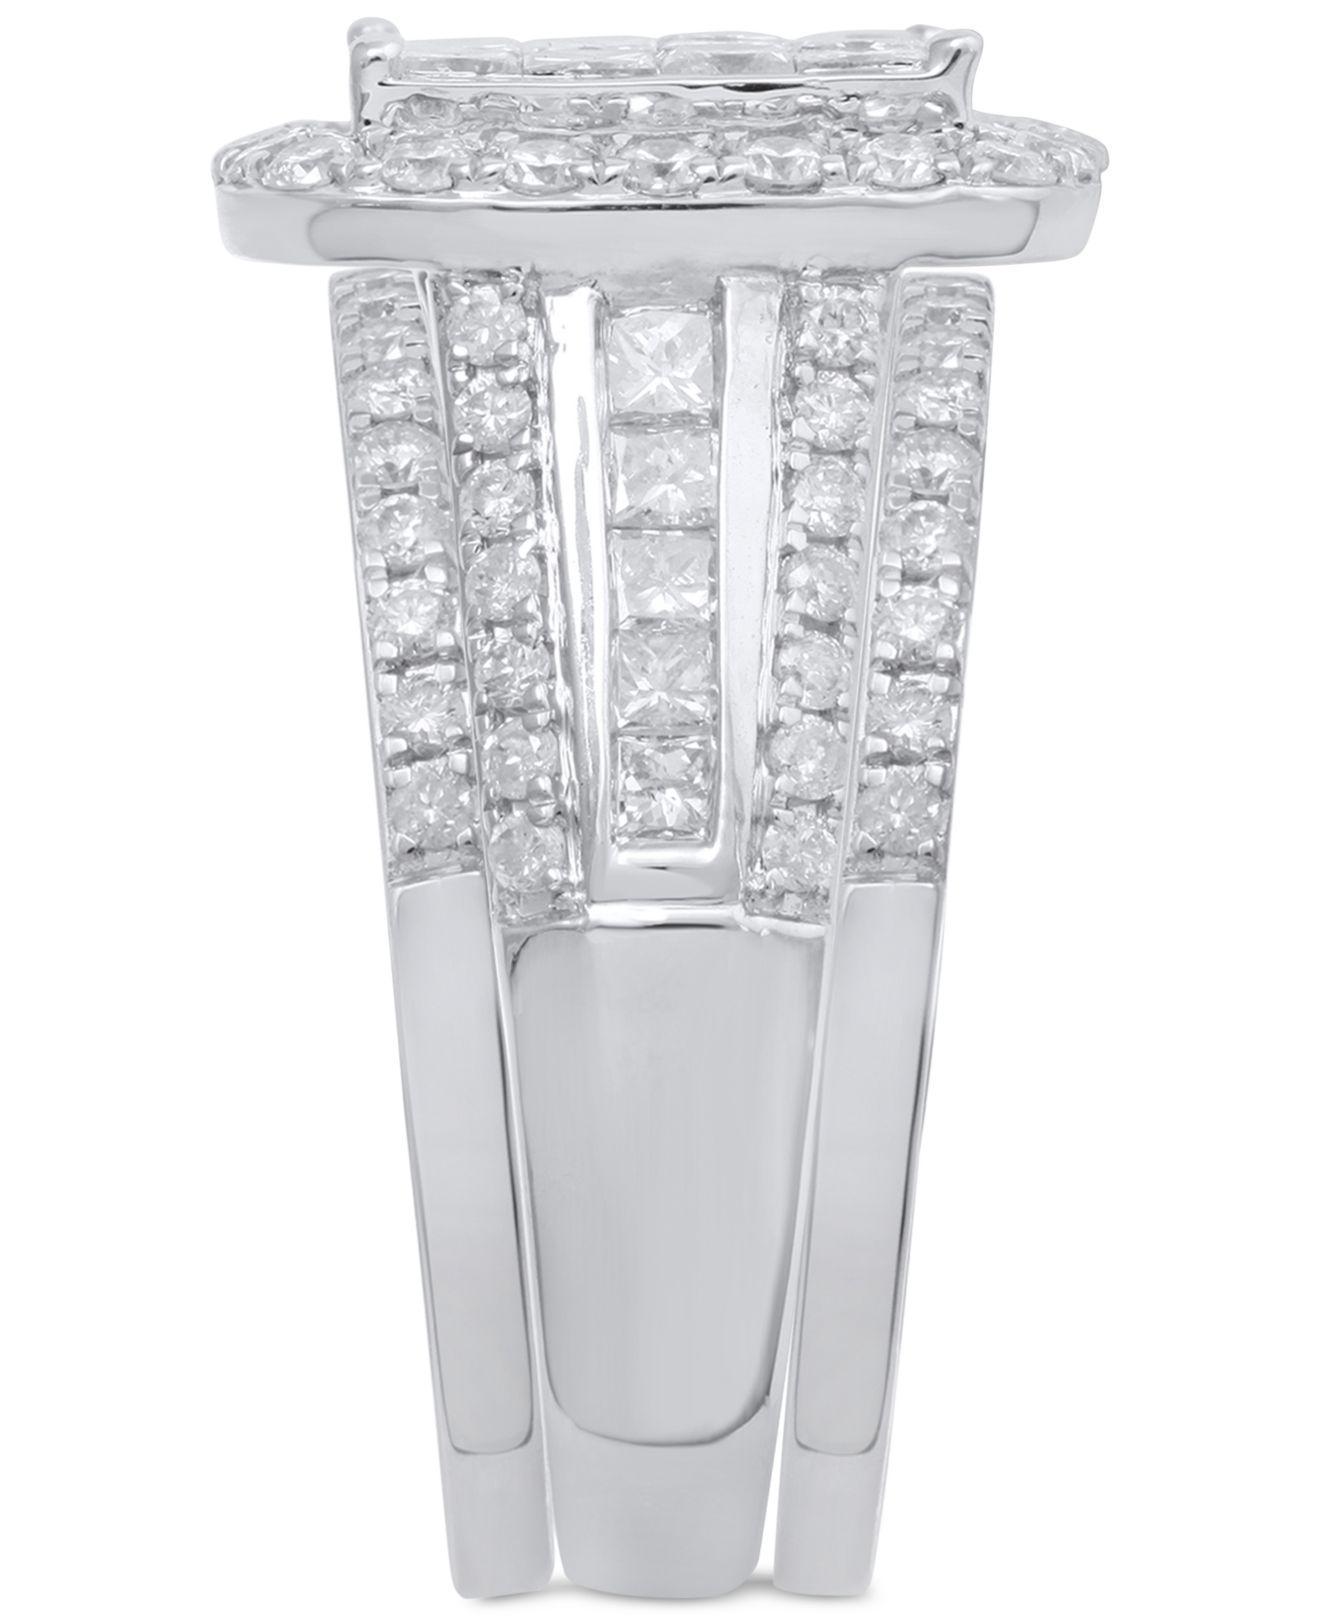 Macy s Diamond 3 pc Bridal Set 2 1 2 Ct T w In 14k White Gold